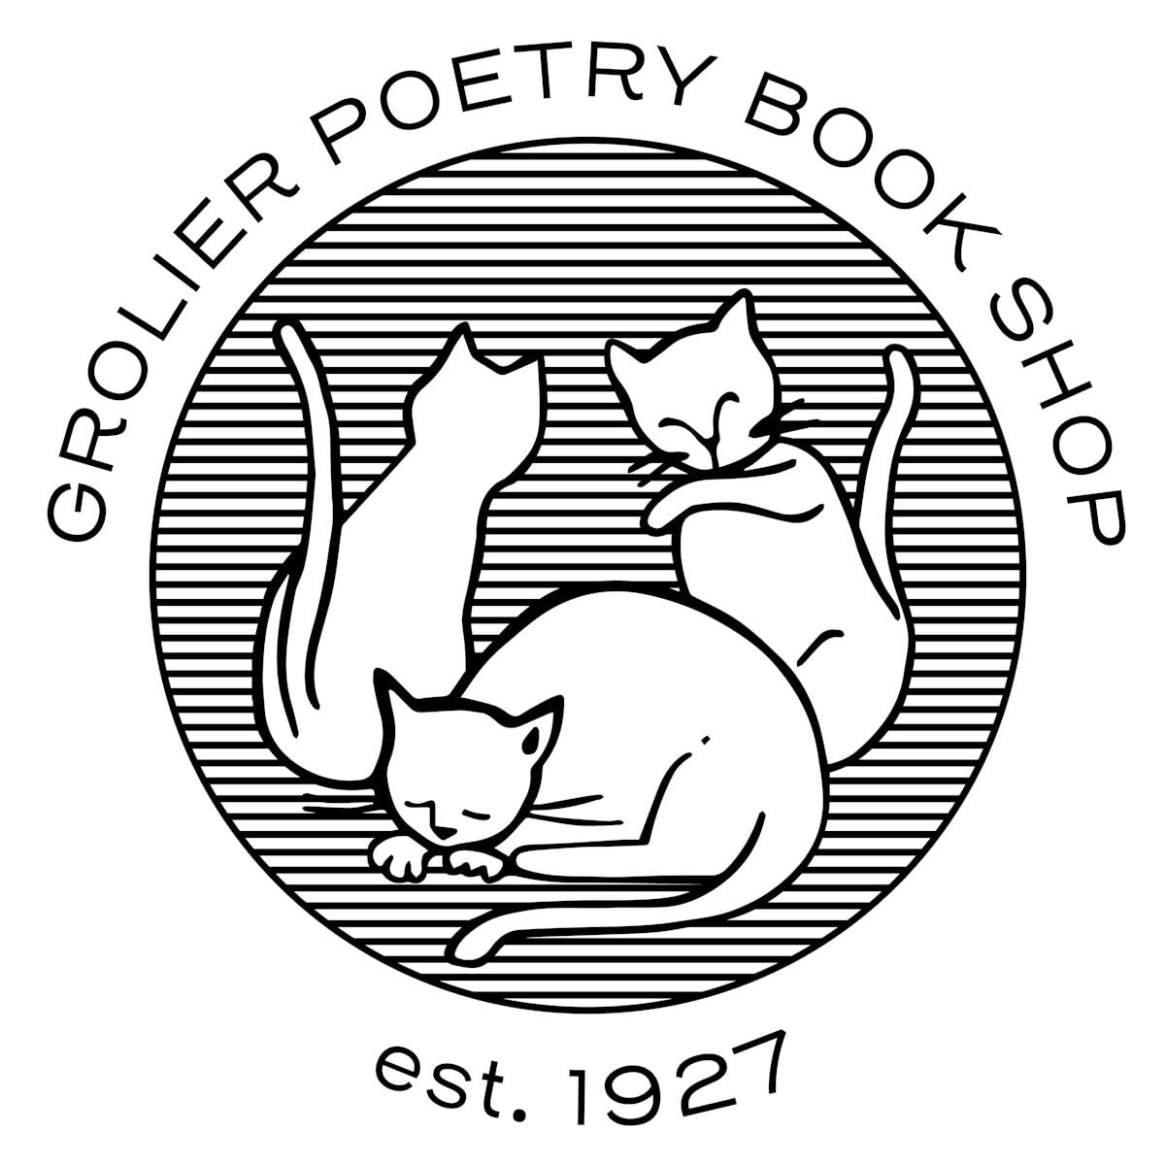 Grolier Poetry Book Shop Logo